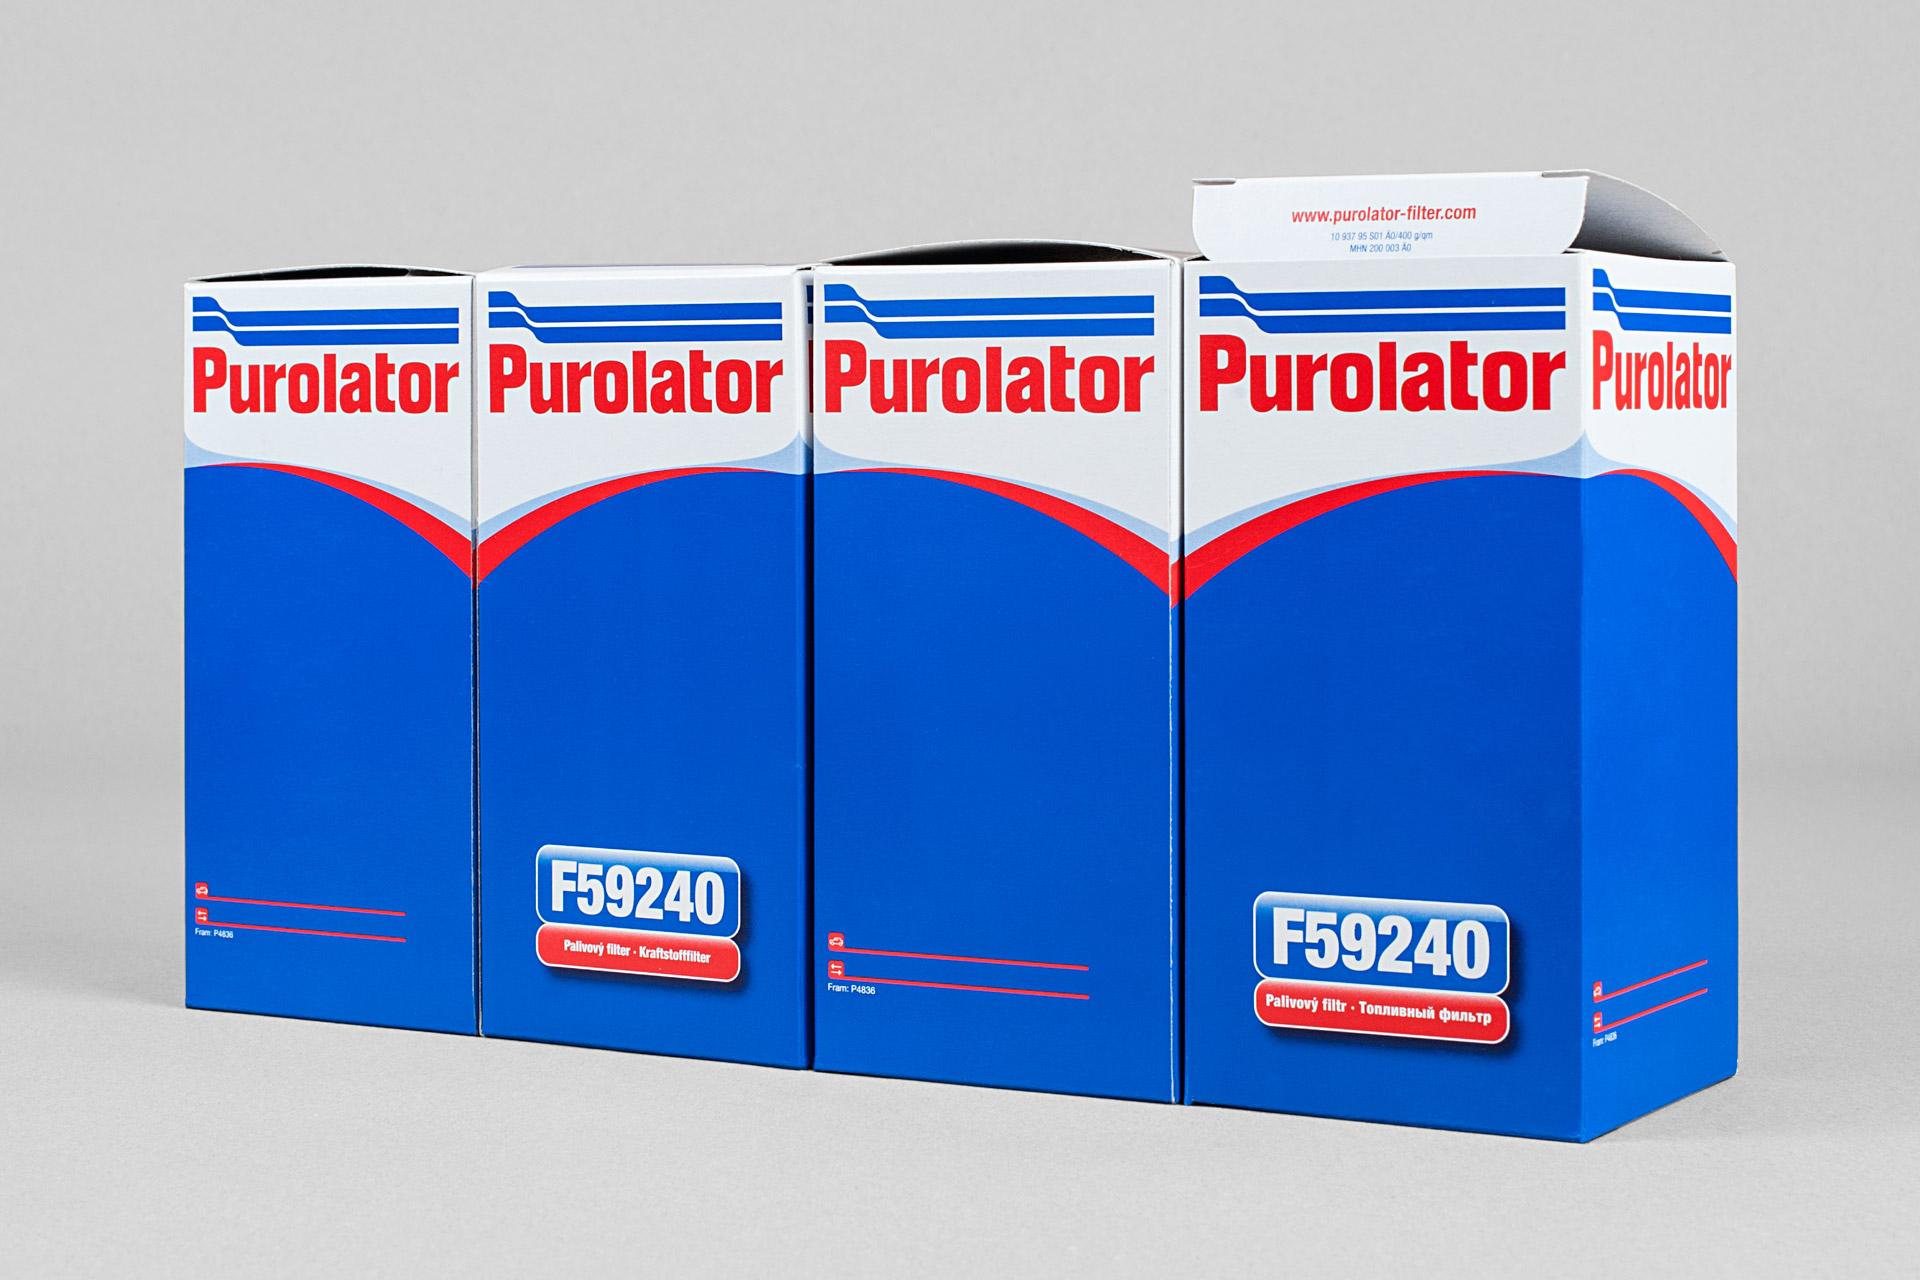 purolator-verpackungsdesign